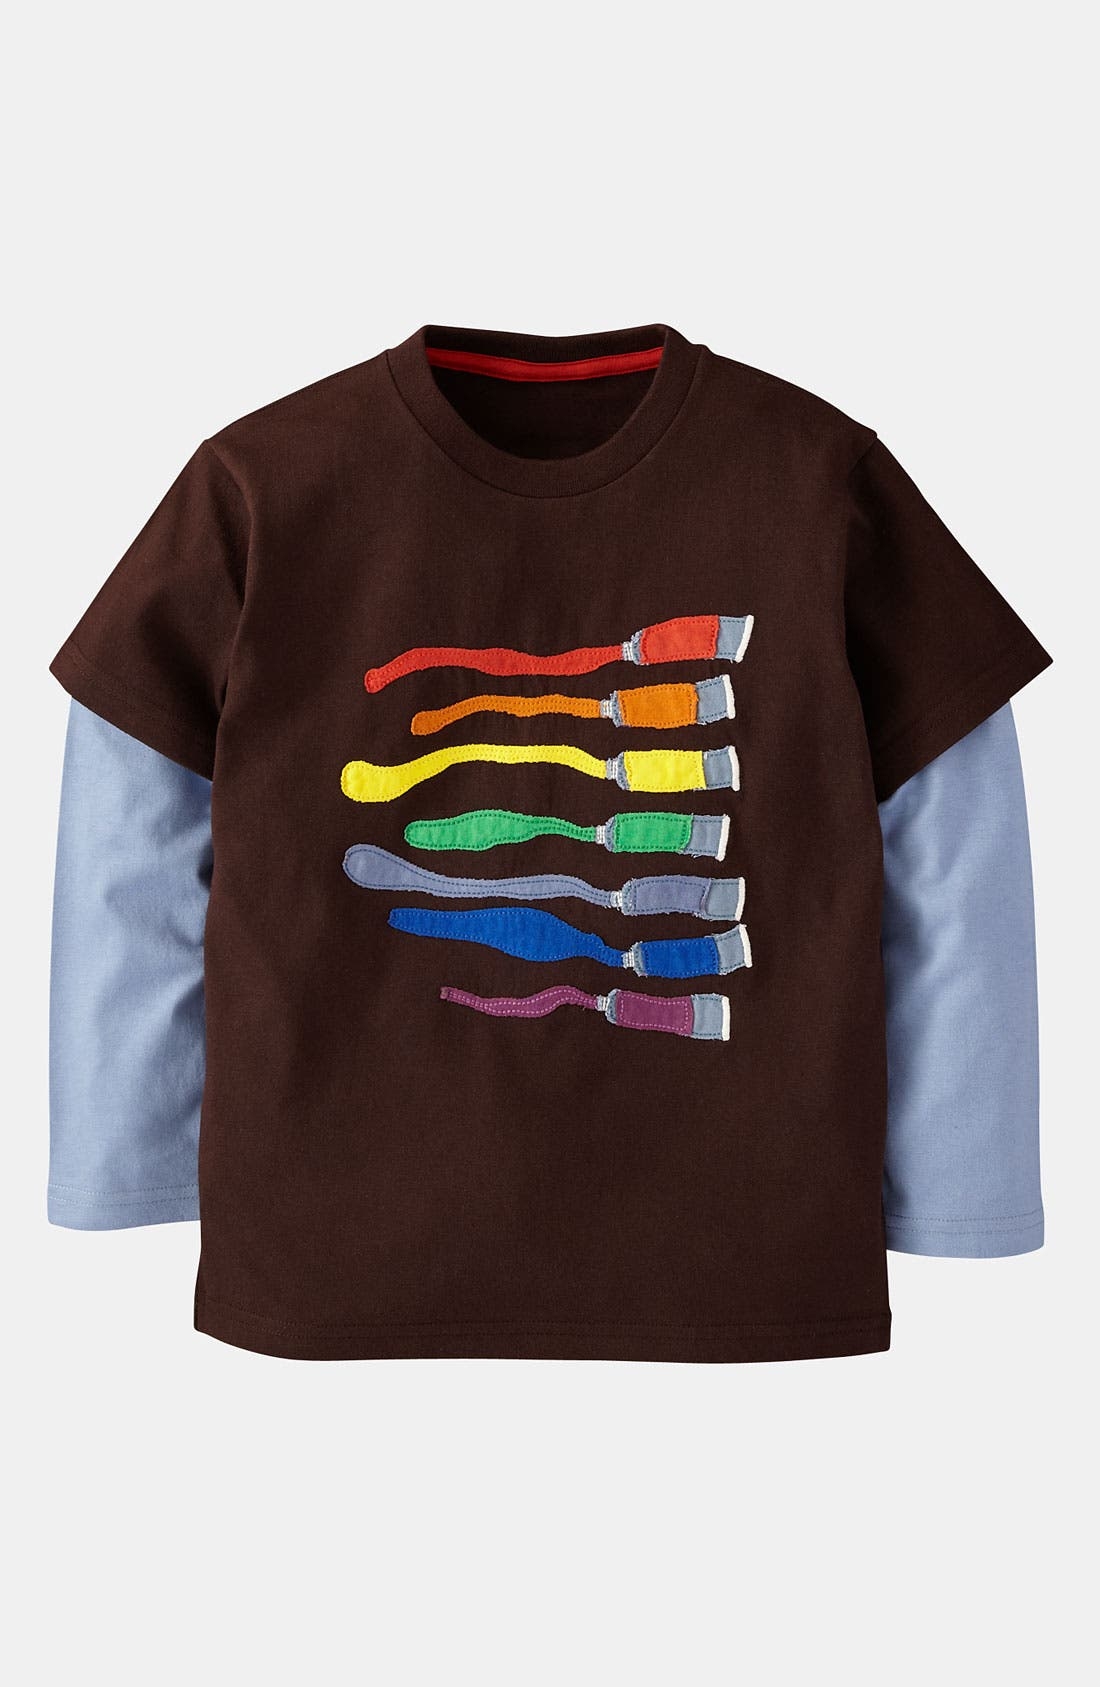 Alternate Image 1 Selected - Mini Boden 'Colorblast' T-Shirt (Little Boys & Big Boys)